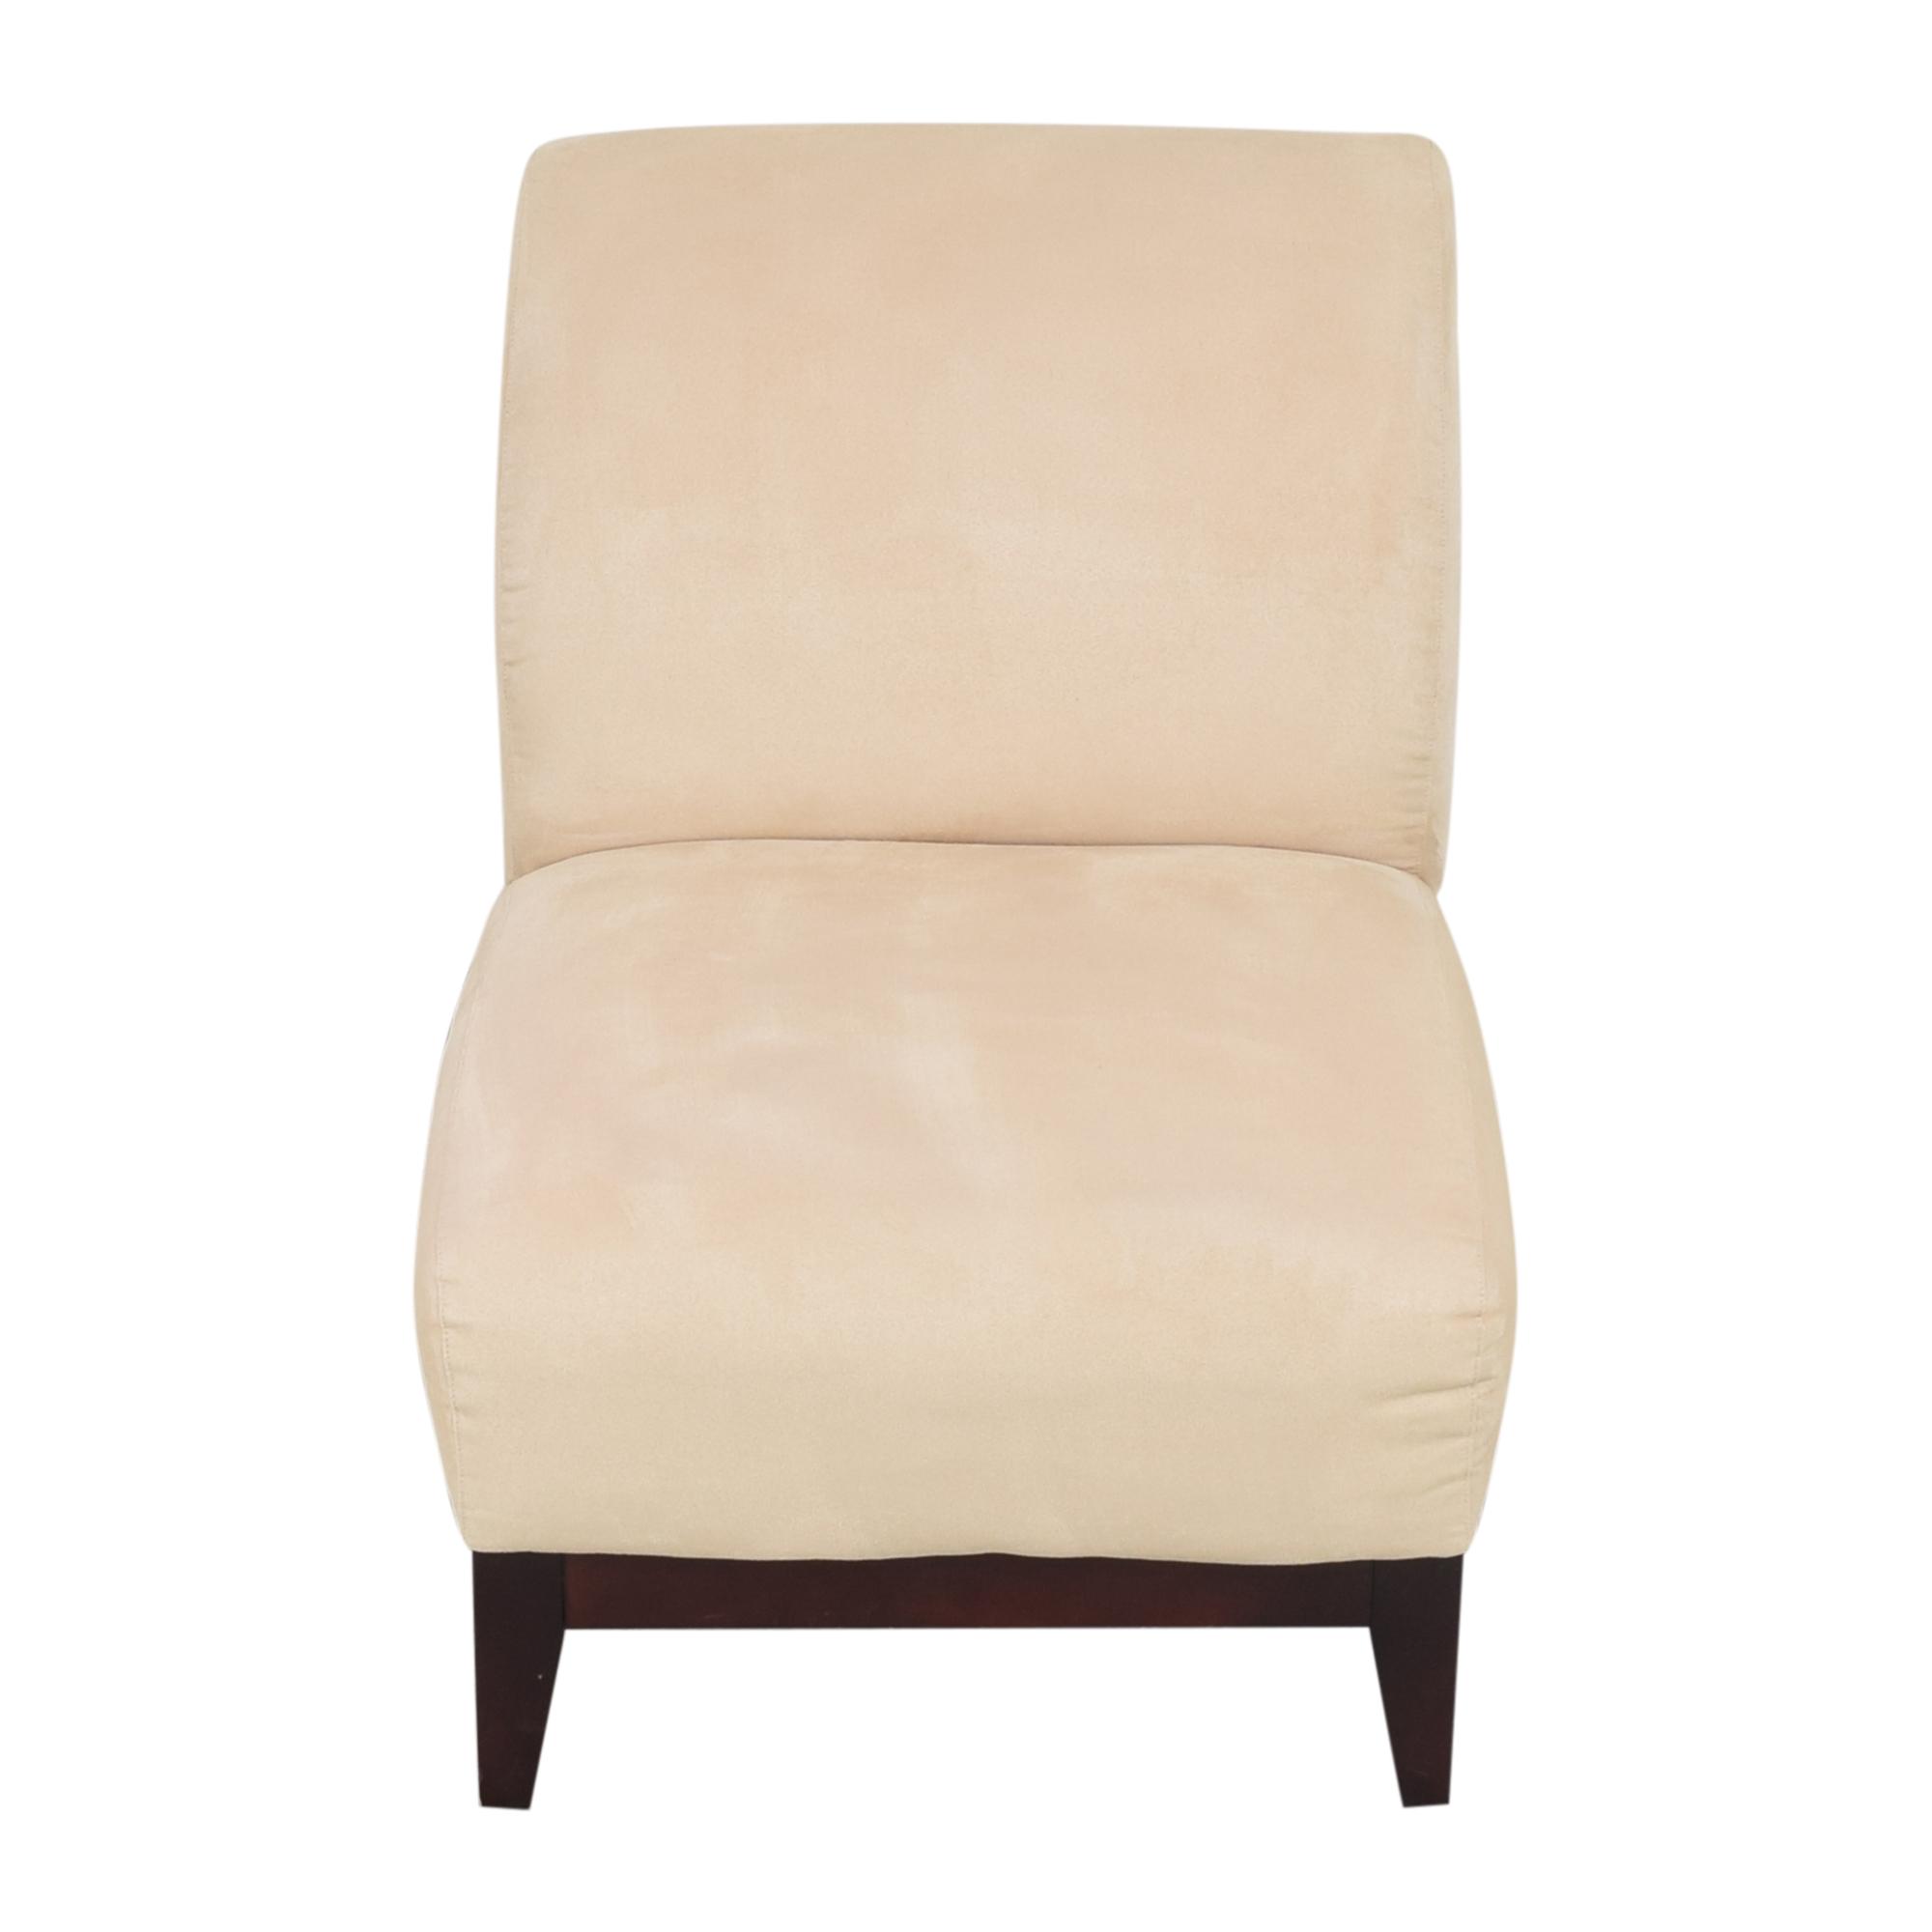 Mitchell Gold + Bob Williams Mitchell Gold + Bob Williams Slipper Chair on sale